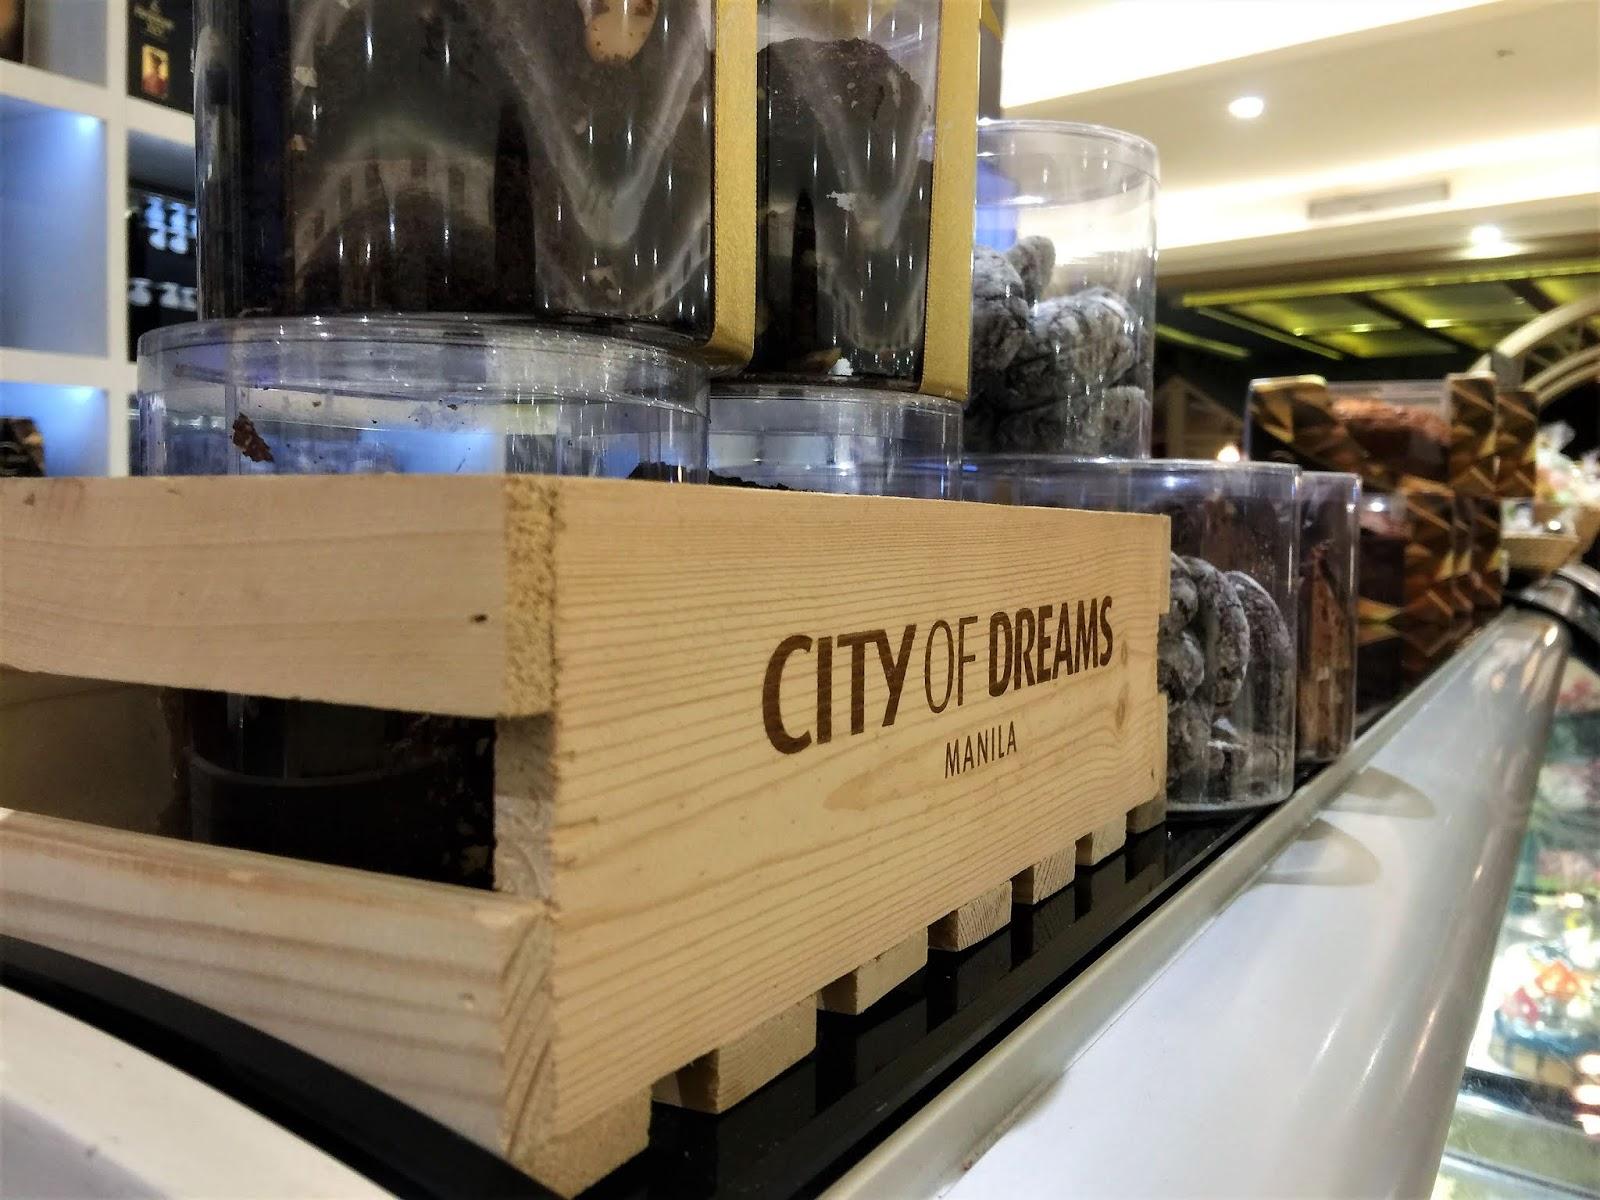 Cafe Society in City of Dreams Manila, Paranaque City